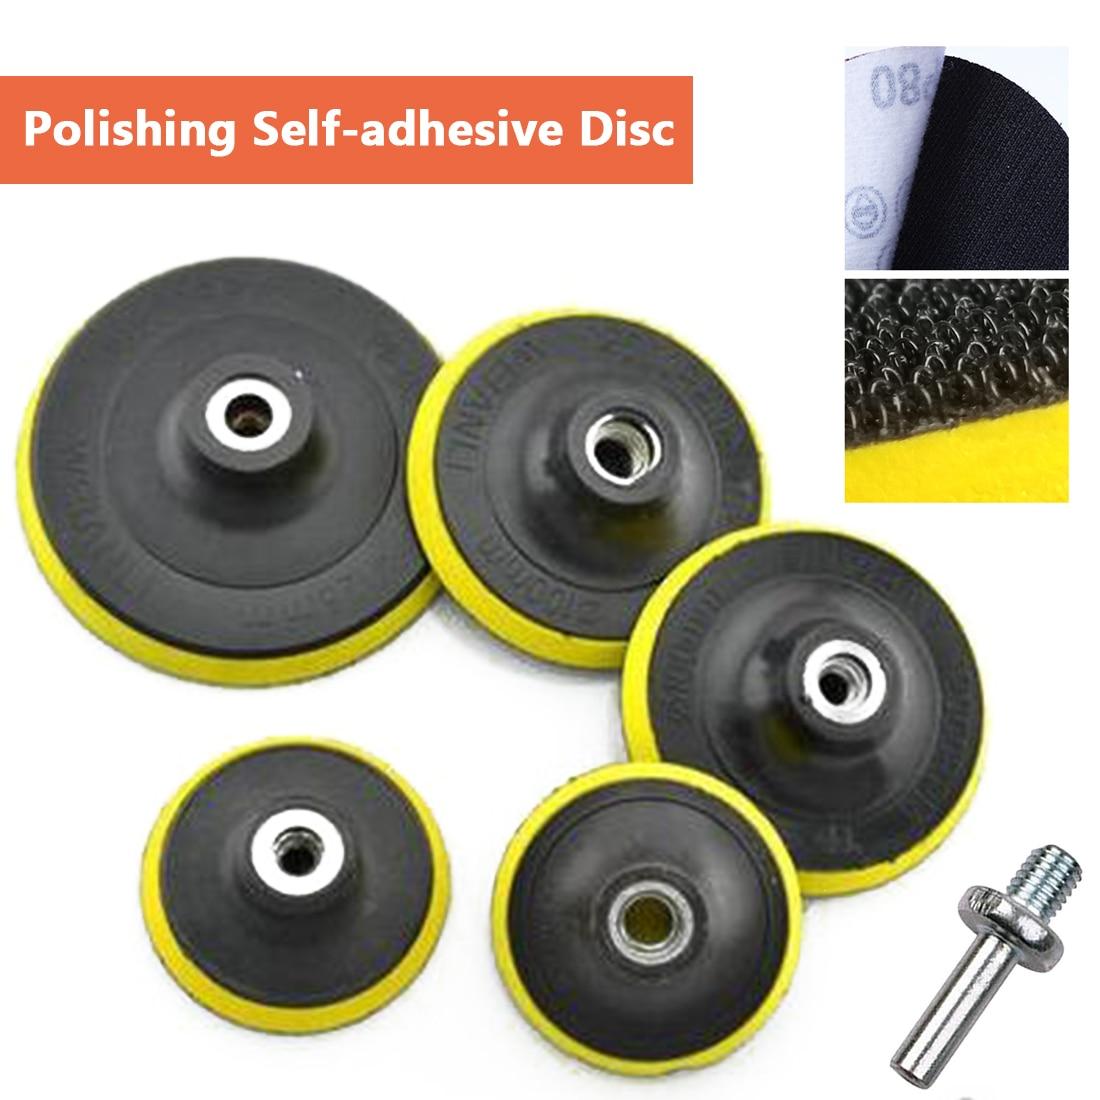 Self-adhesive Polishing Pad 3